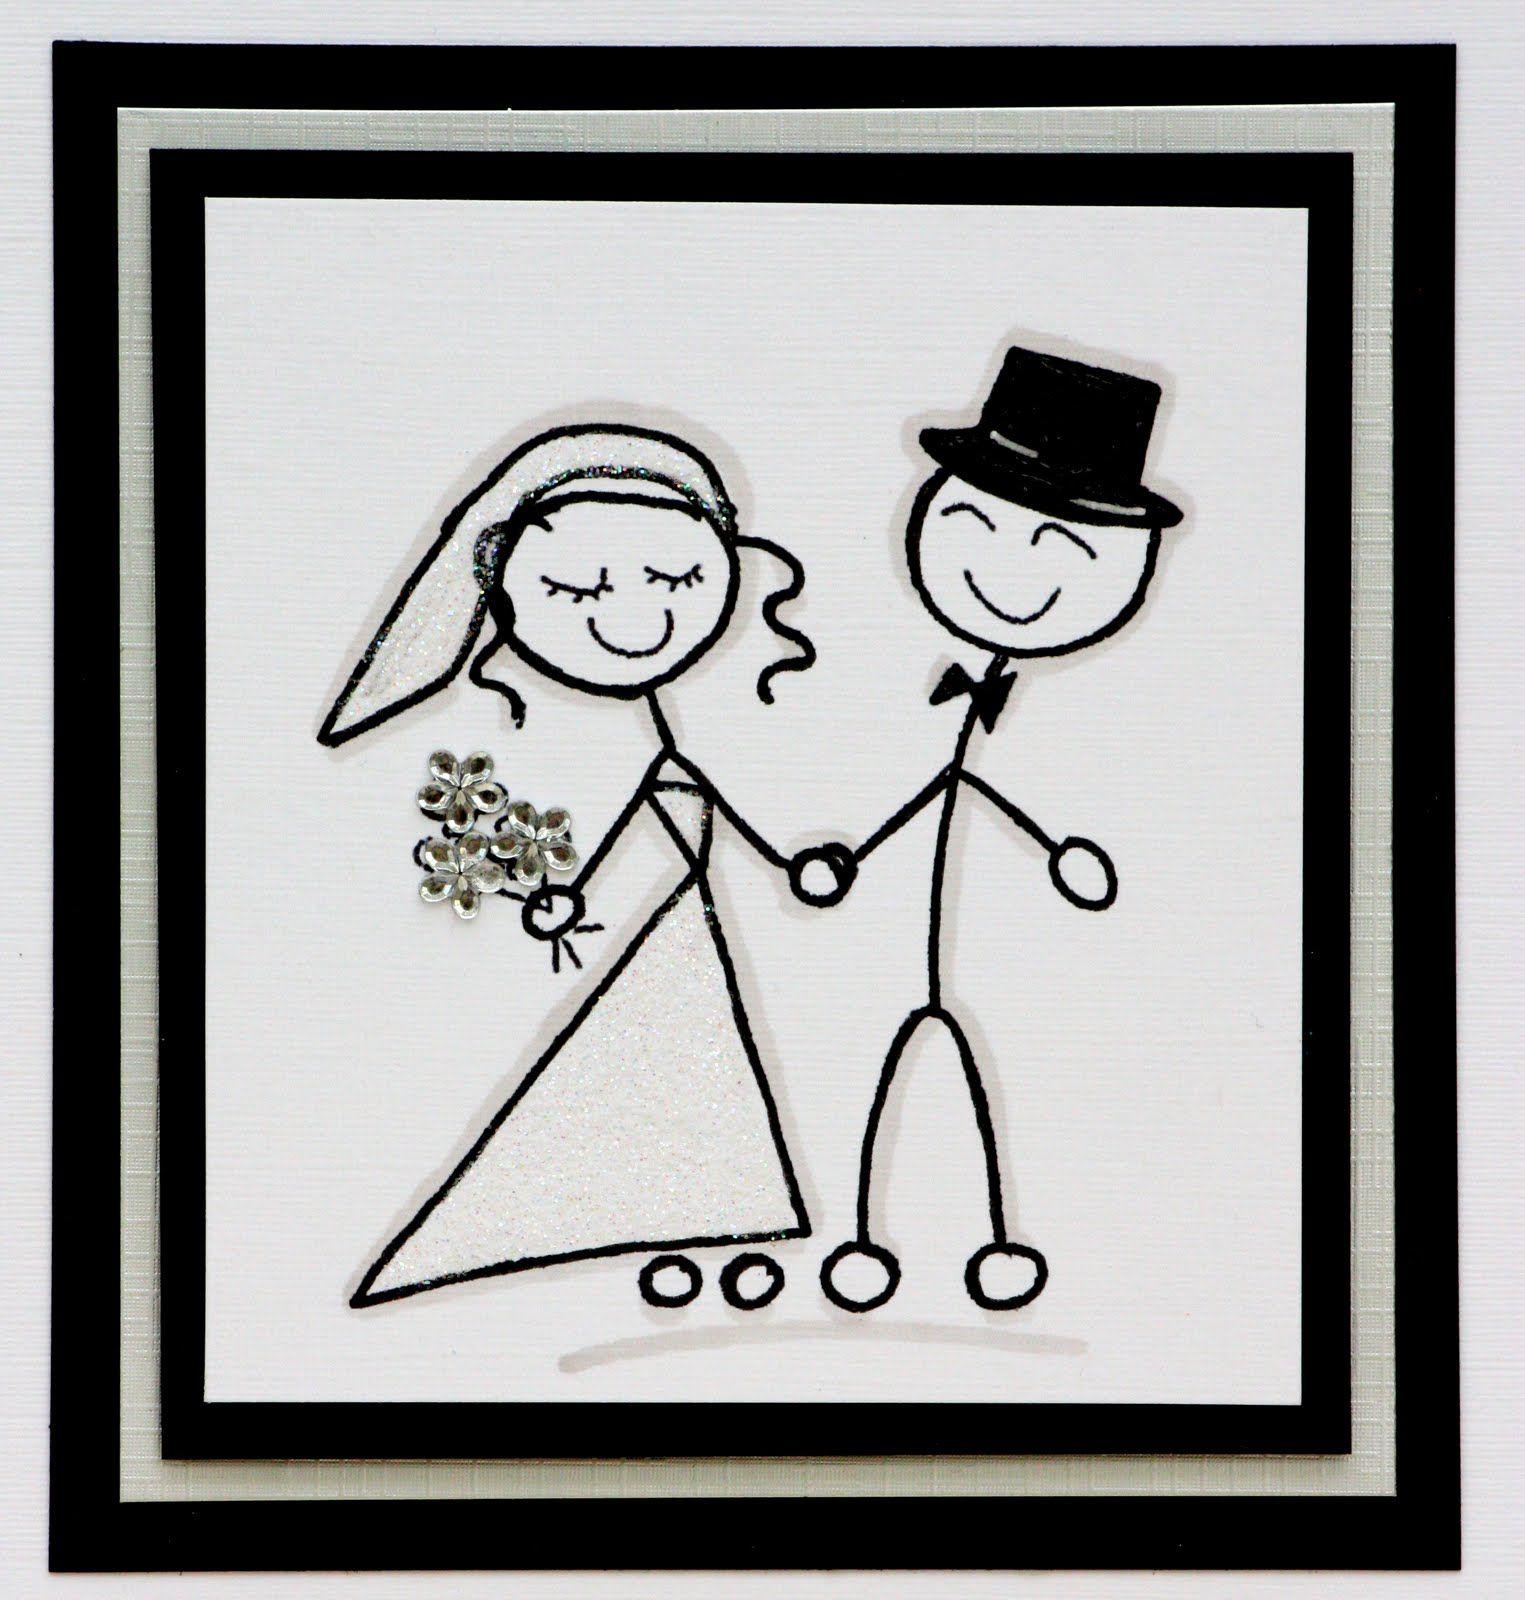 stick figure bride and groom.